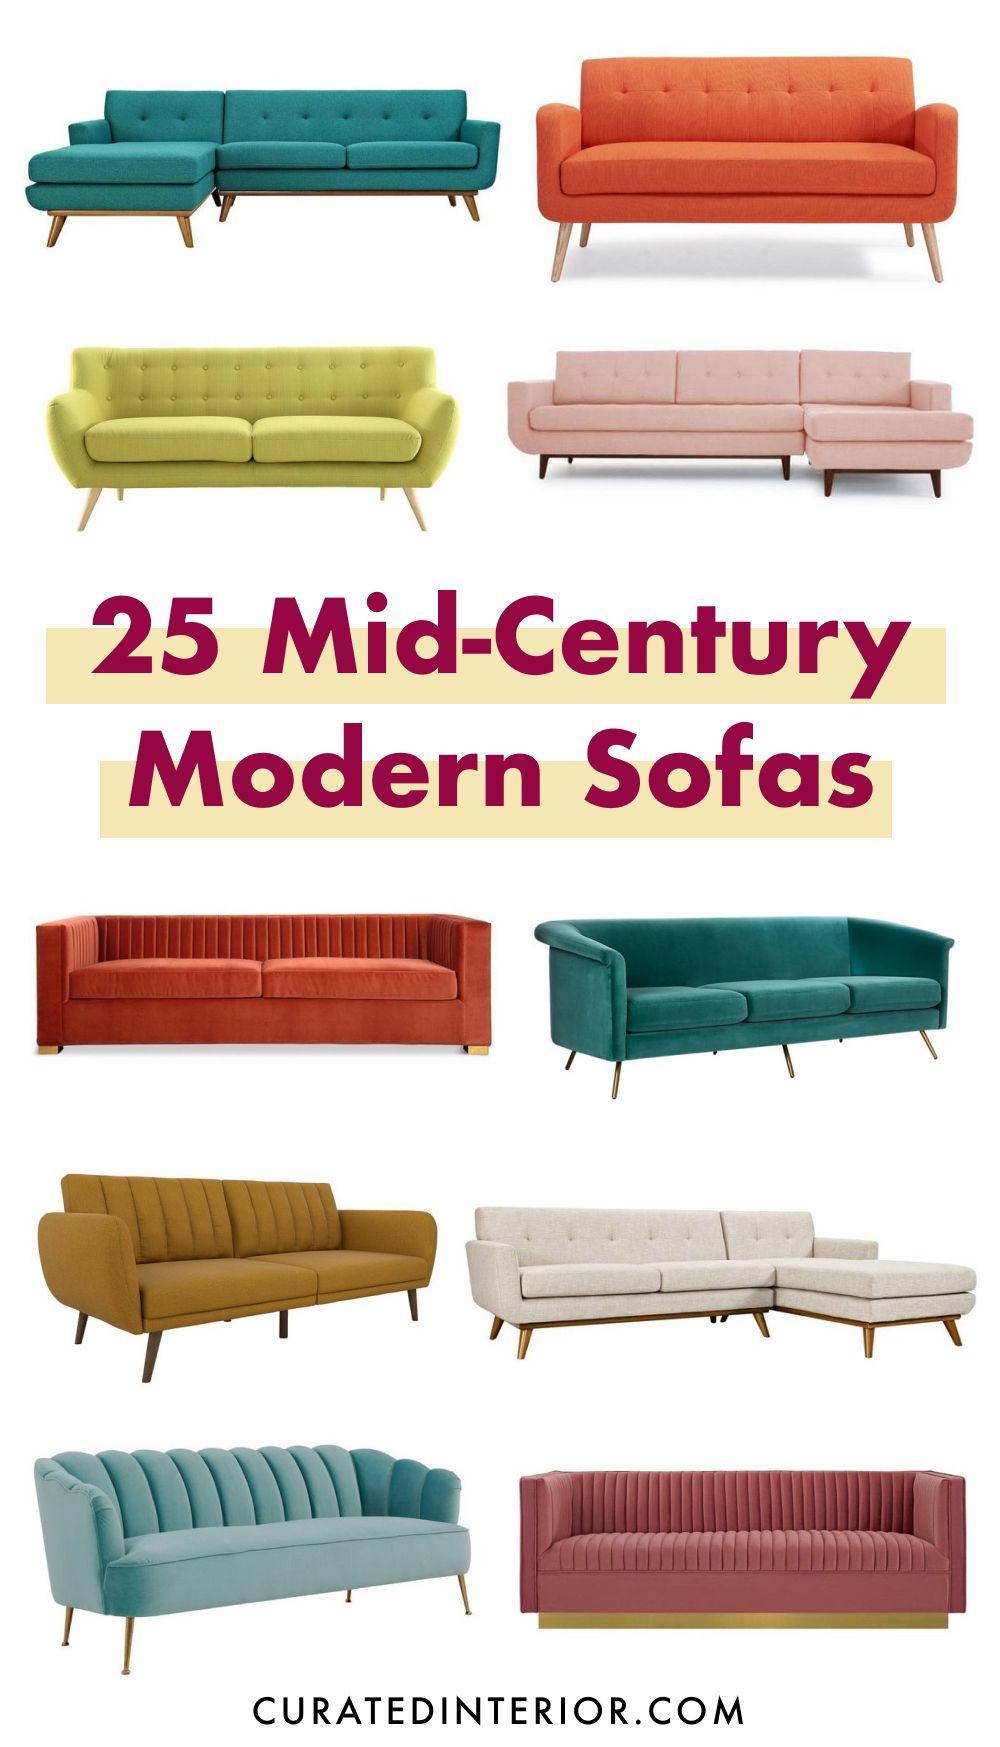 25 Mid-century Modern Sofas